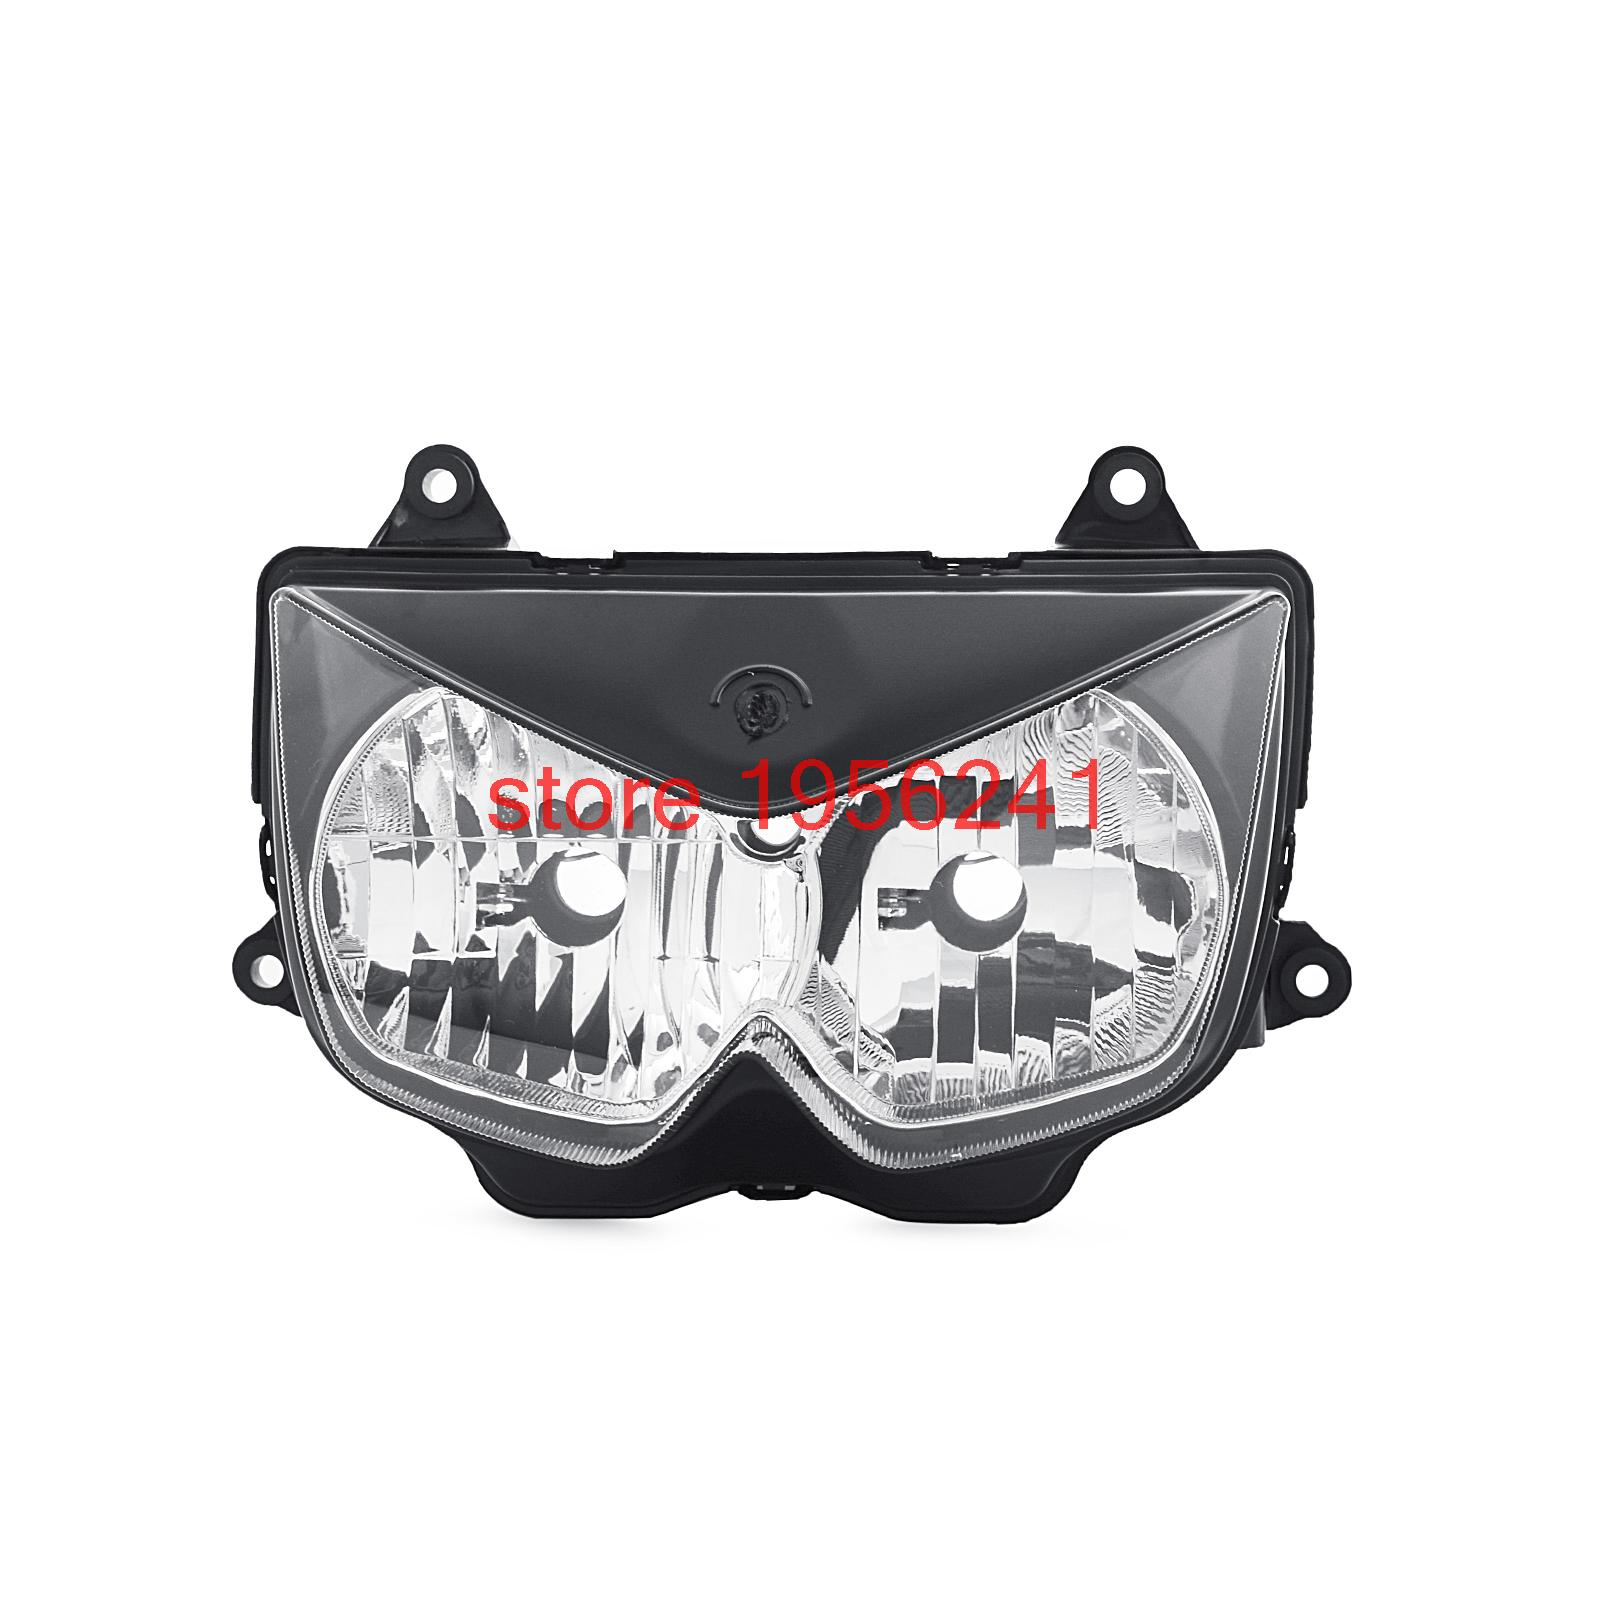 ABS Plastic Motorcycle  Headlight Headlamp Kit For Kawasaki Ninja 250R 2008 2009 2010 2011 2012 Replace OEM 23007-0121